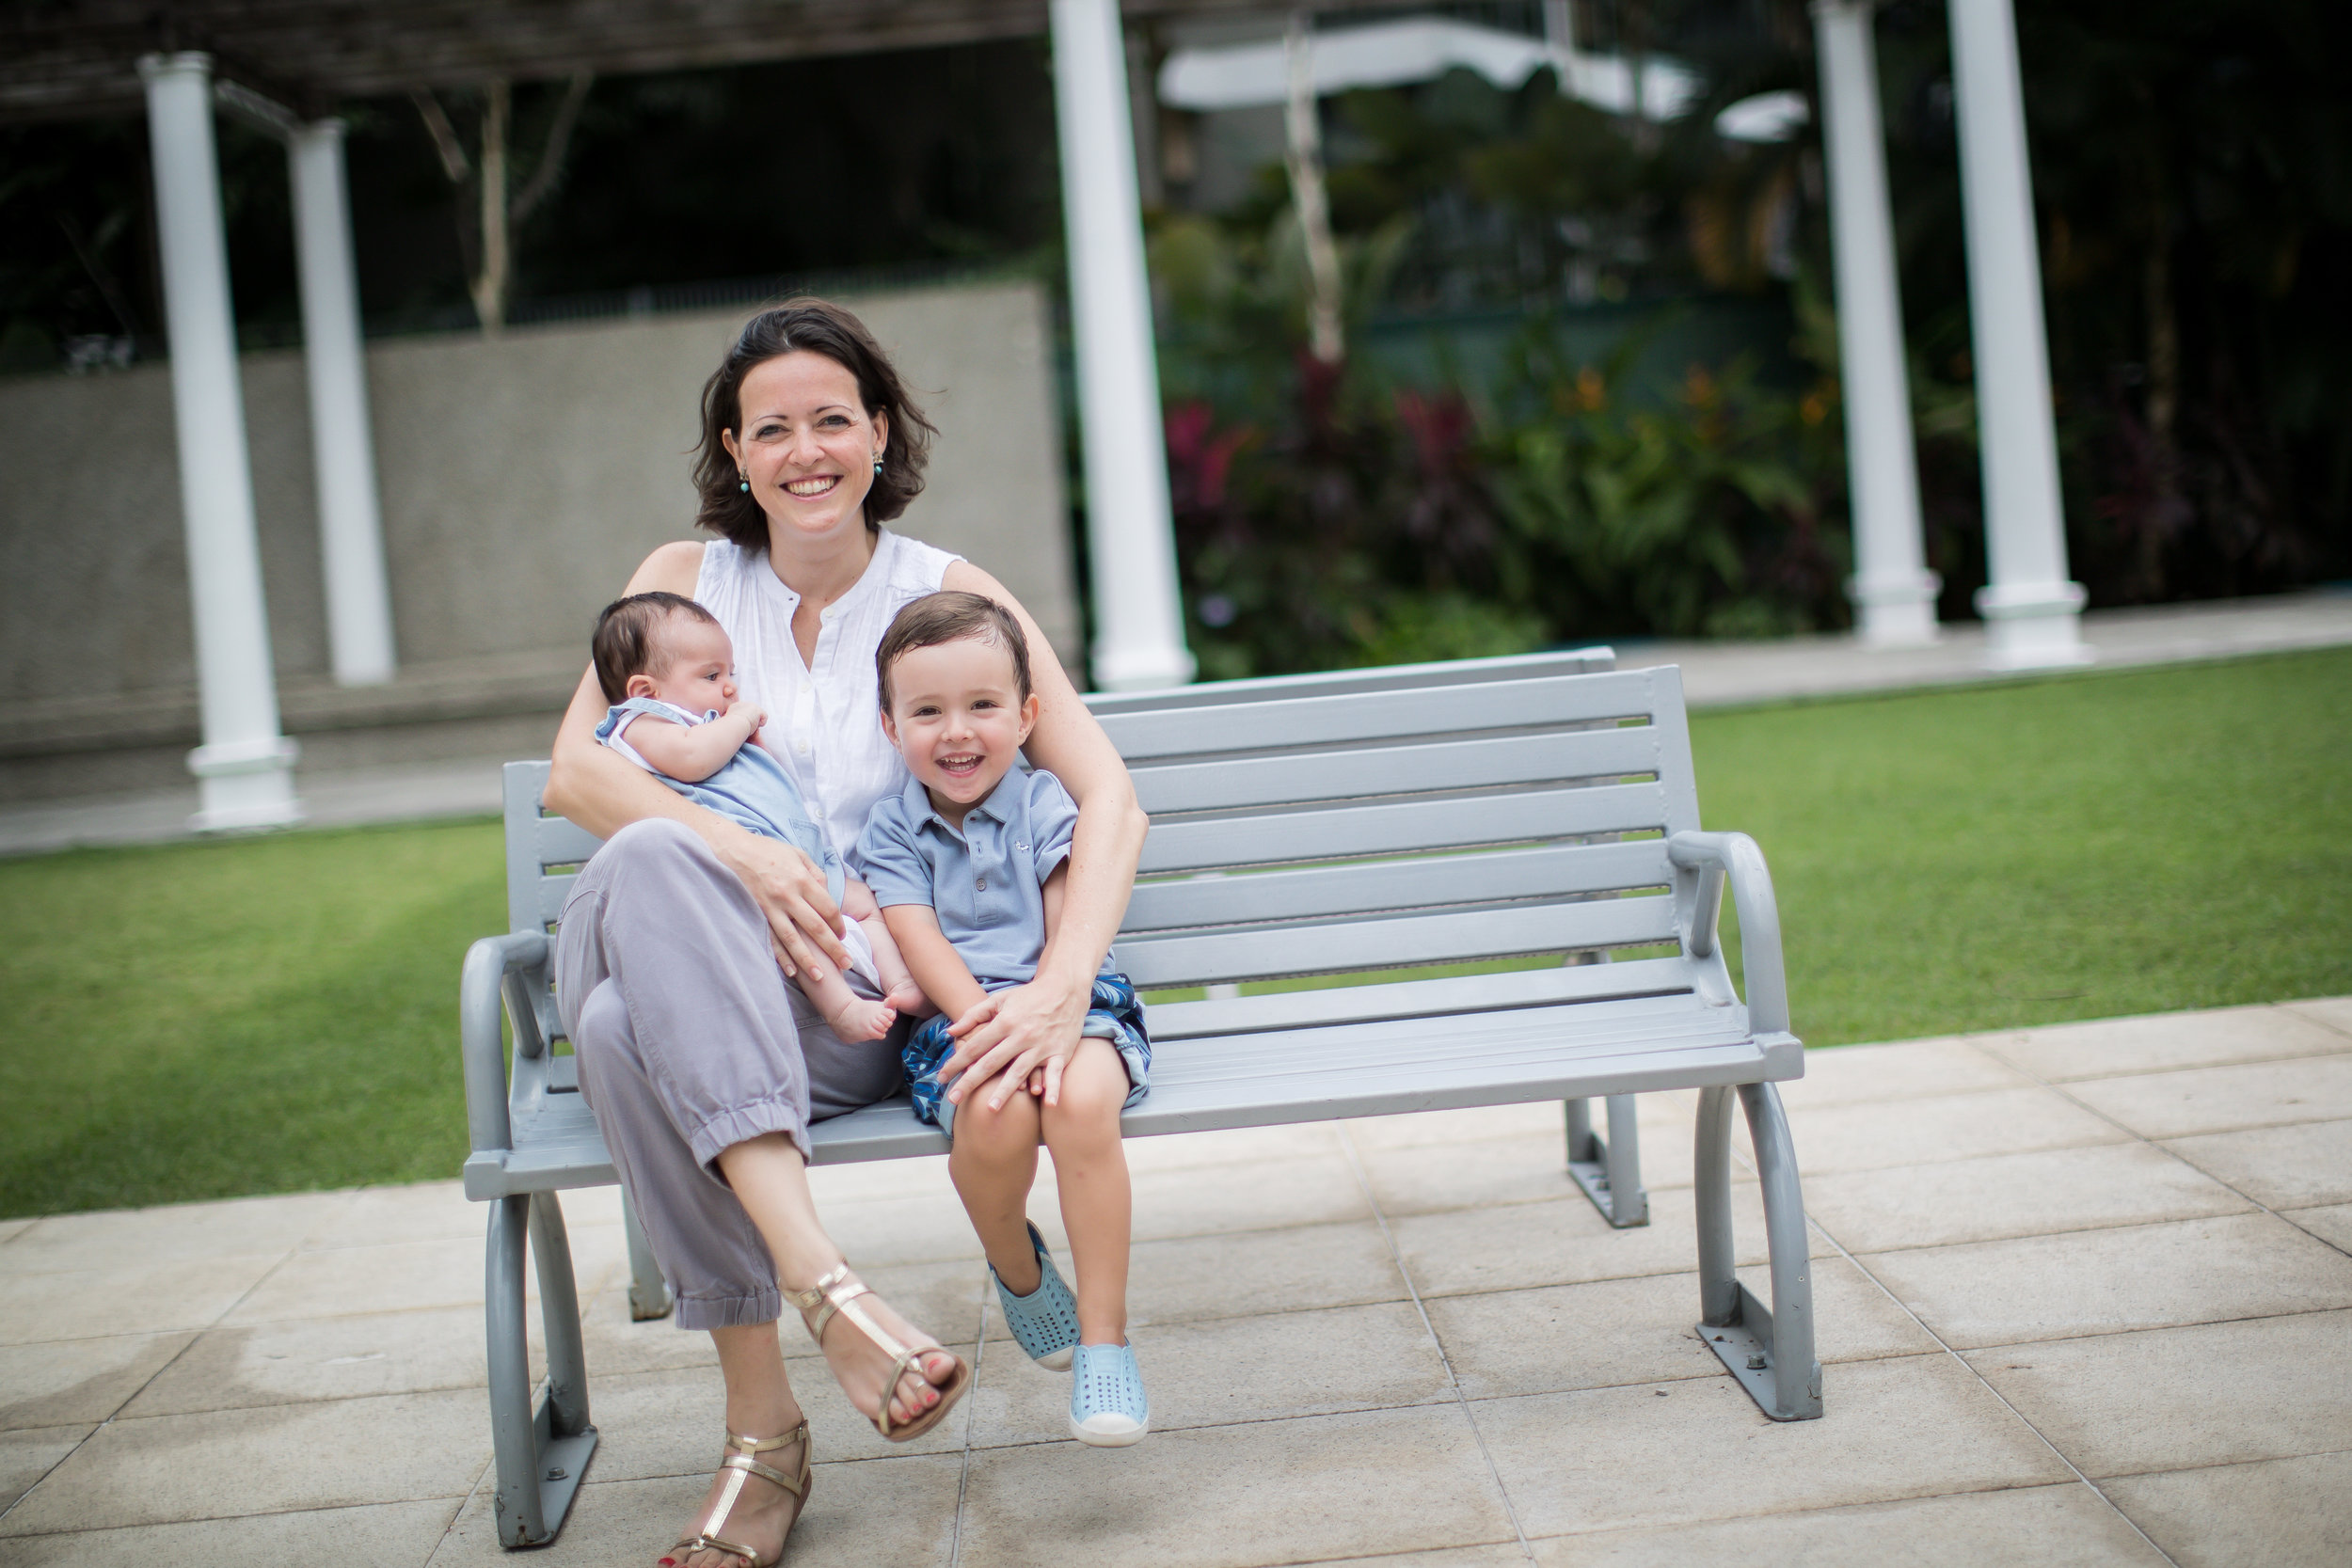 Singapore Family photographer home visit Vision Photography Daniel Parker